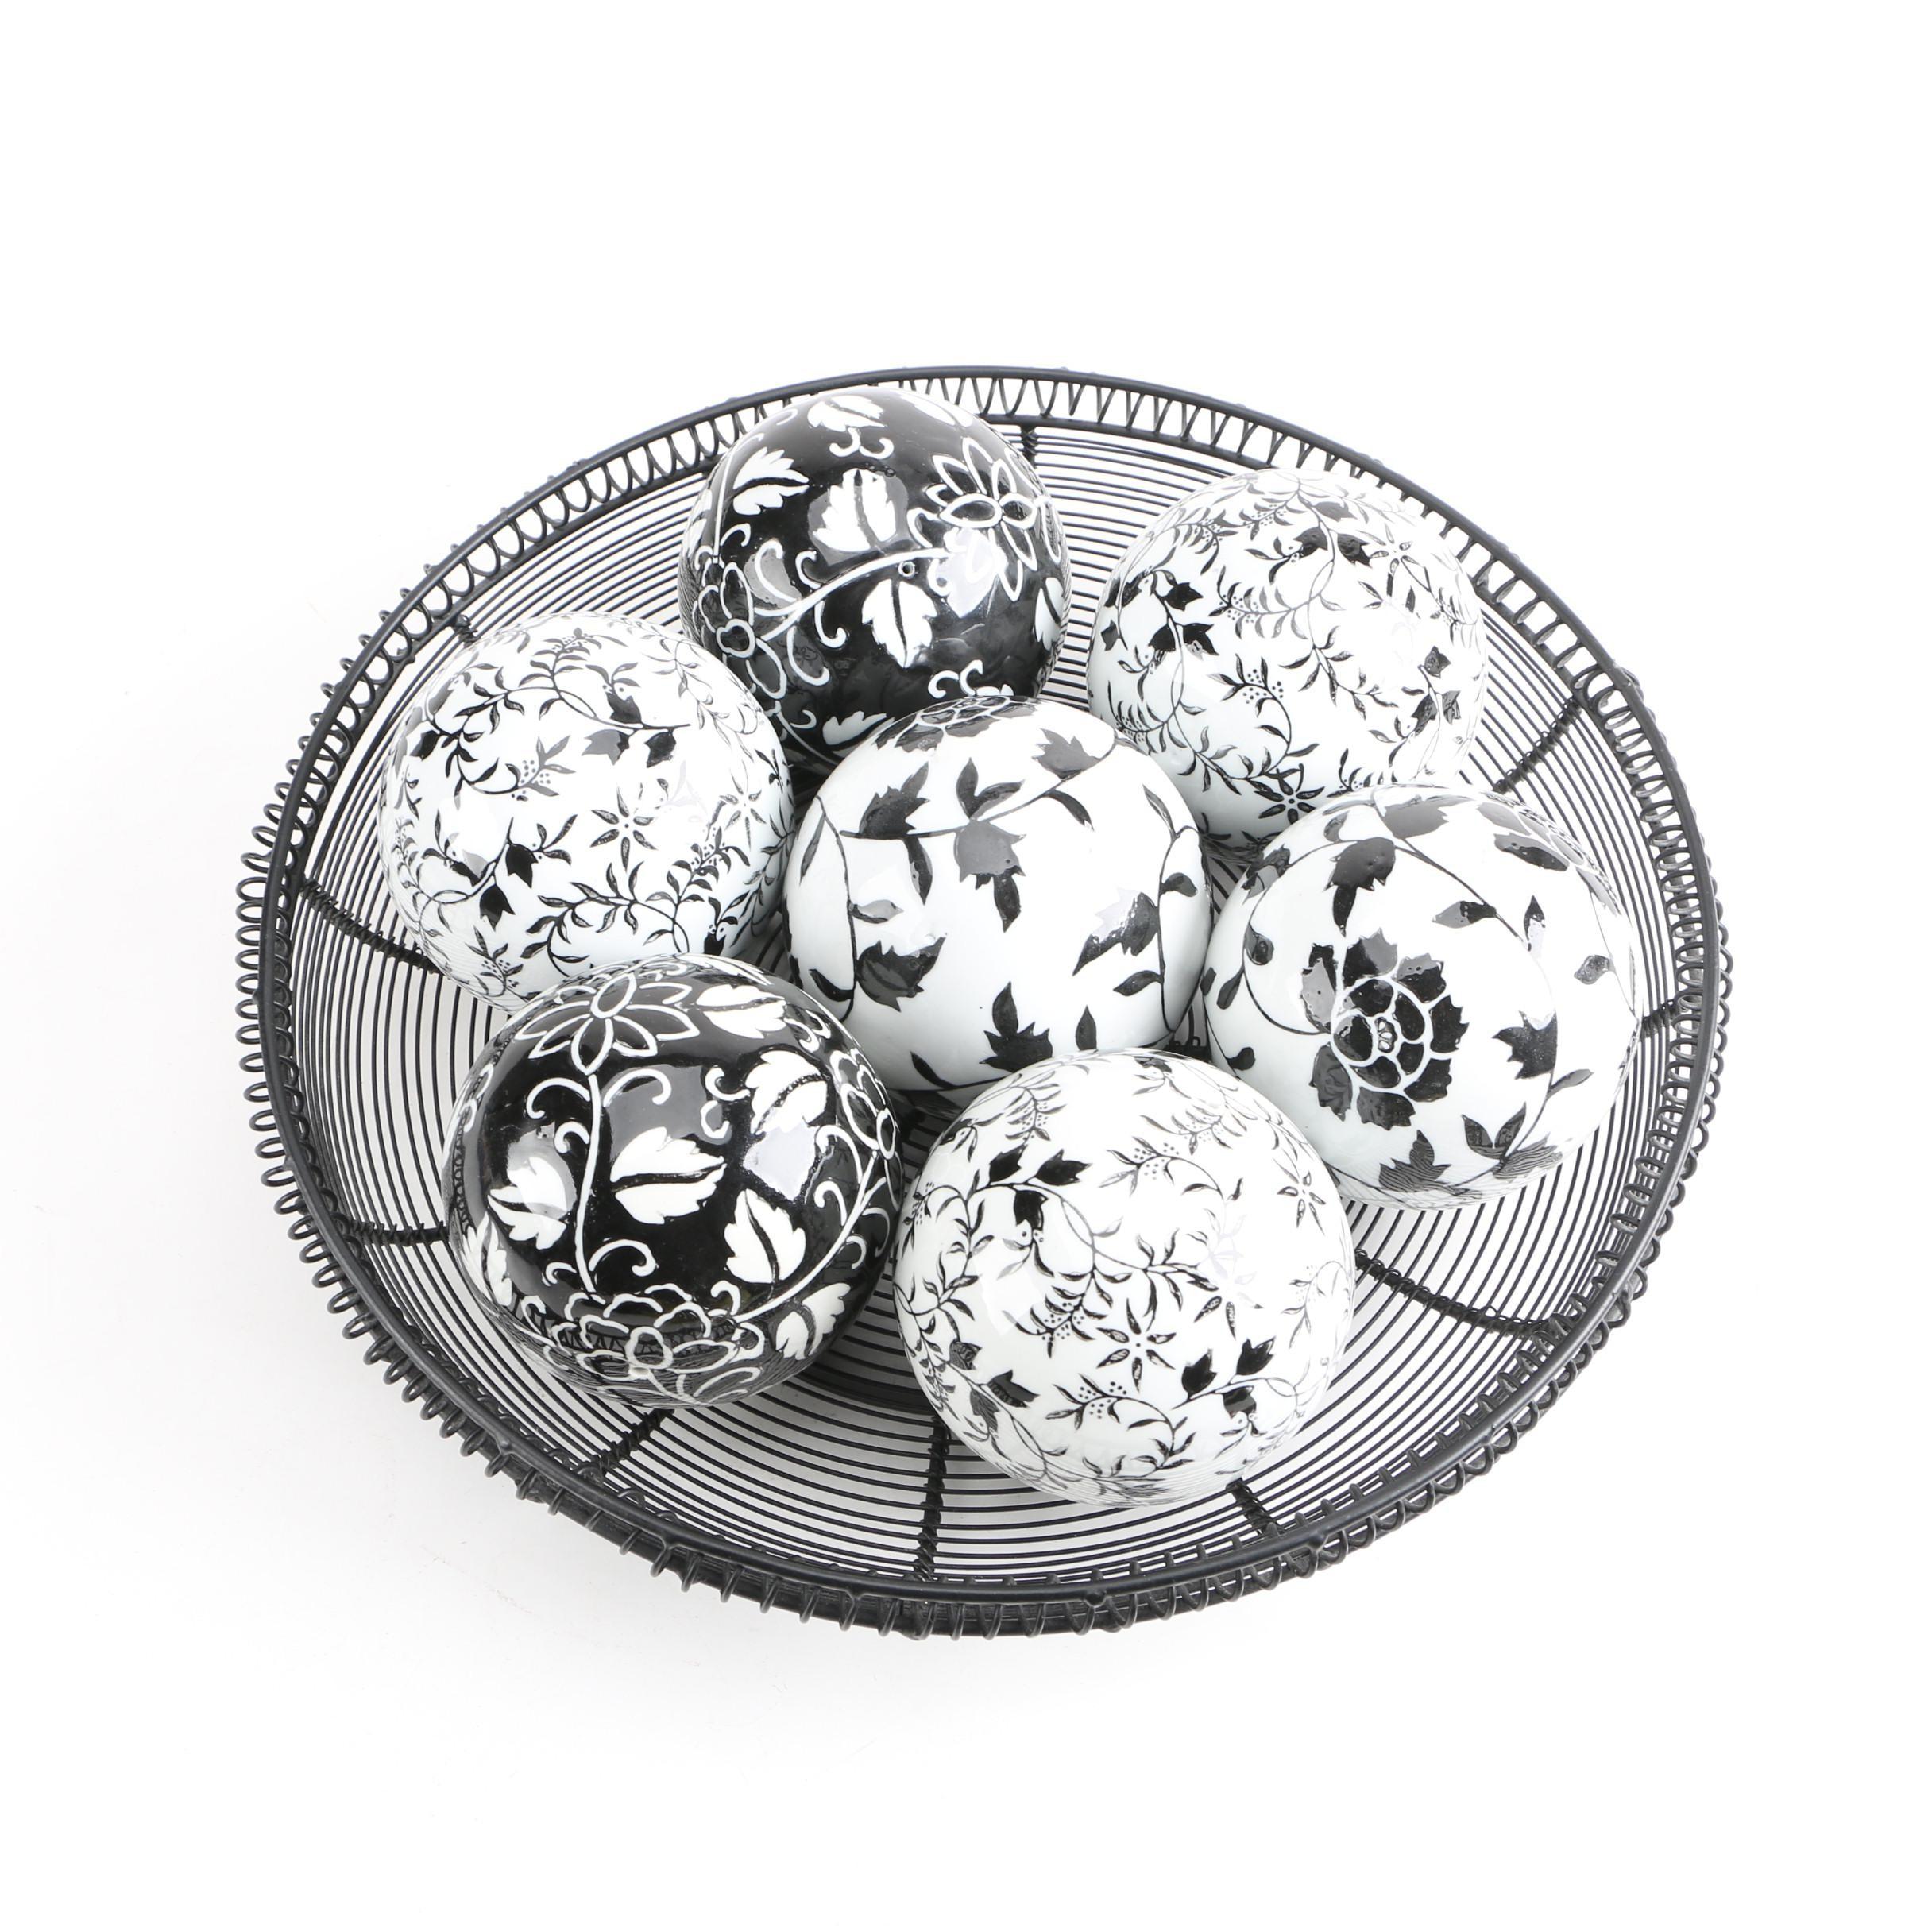 Black Decorative Balls For Bowls: Black And White Decorative Ceramic Carpet Balls And Wire